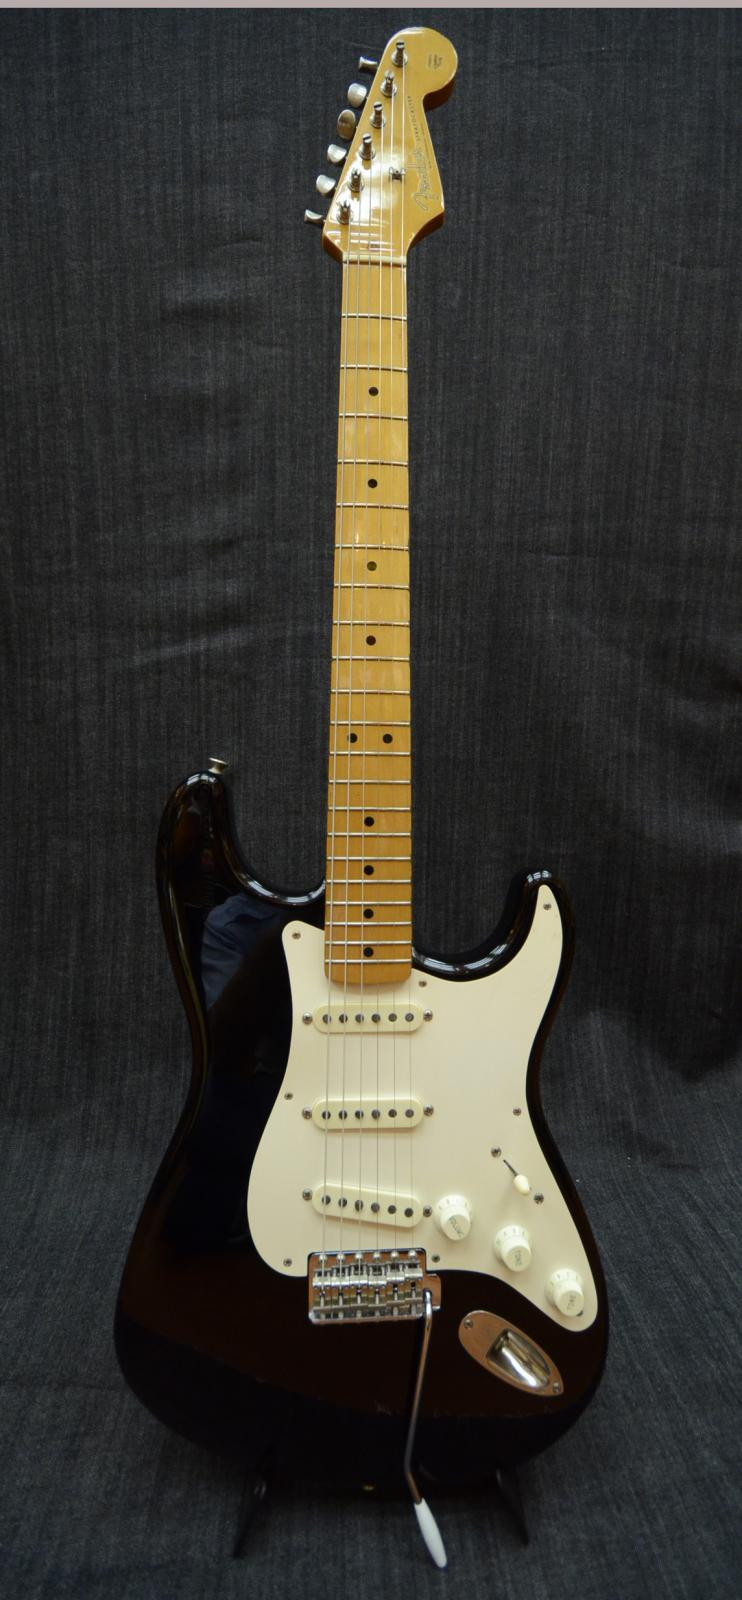 Fender USA American Vintage 57 Stratocaster | Shimokura Musical